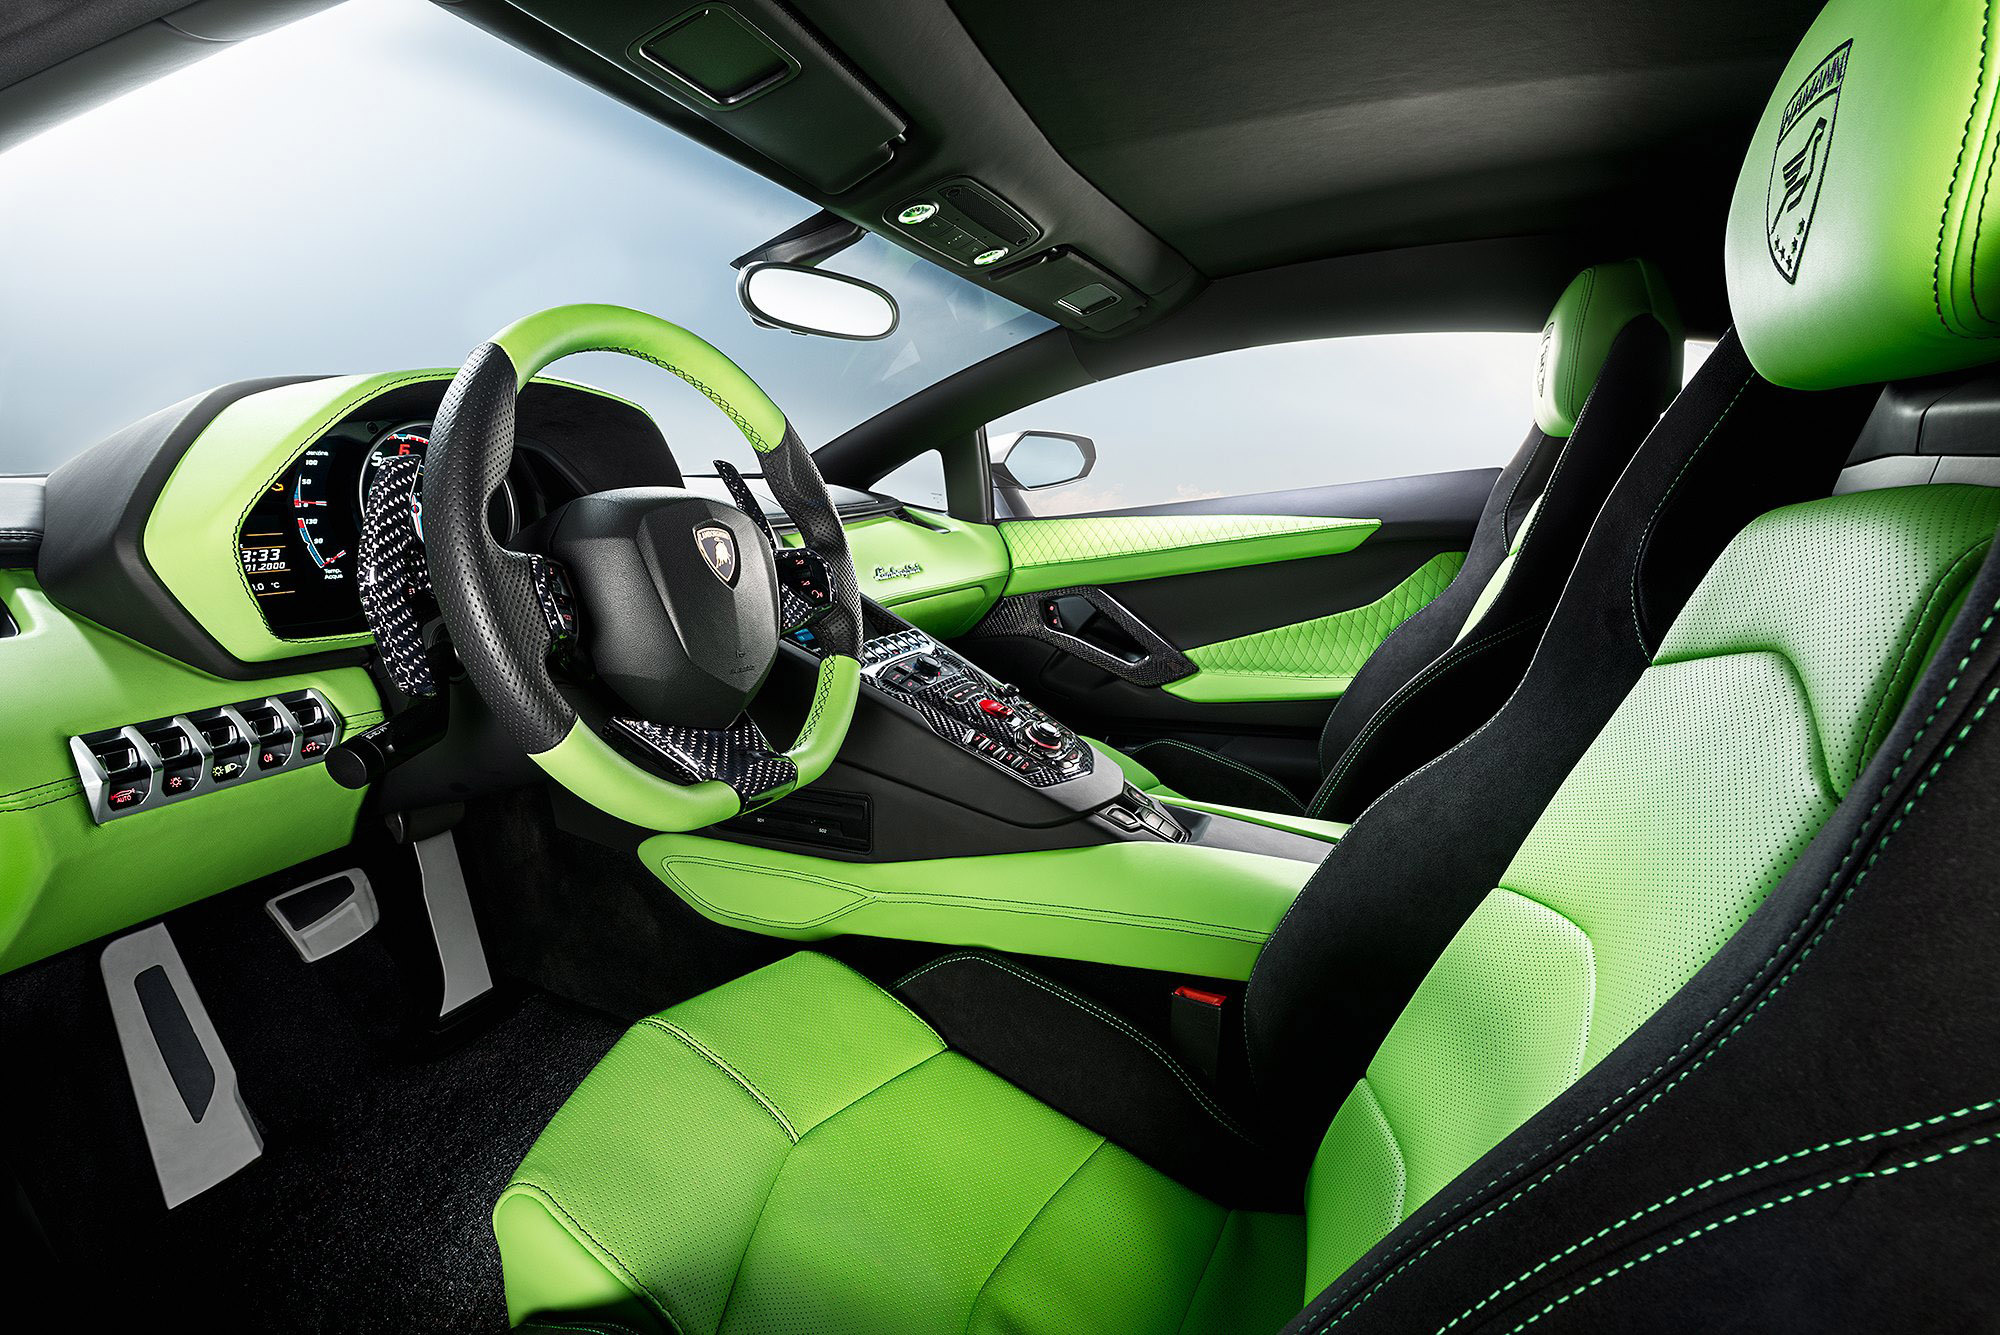 136681 download wallpaper Lamborghini, Cars, 2014, Aventador, Lp700-4, Auto Salon screensavers and pictures for free